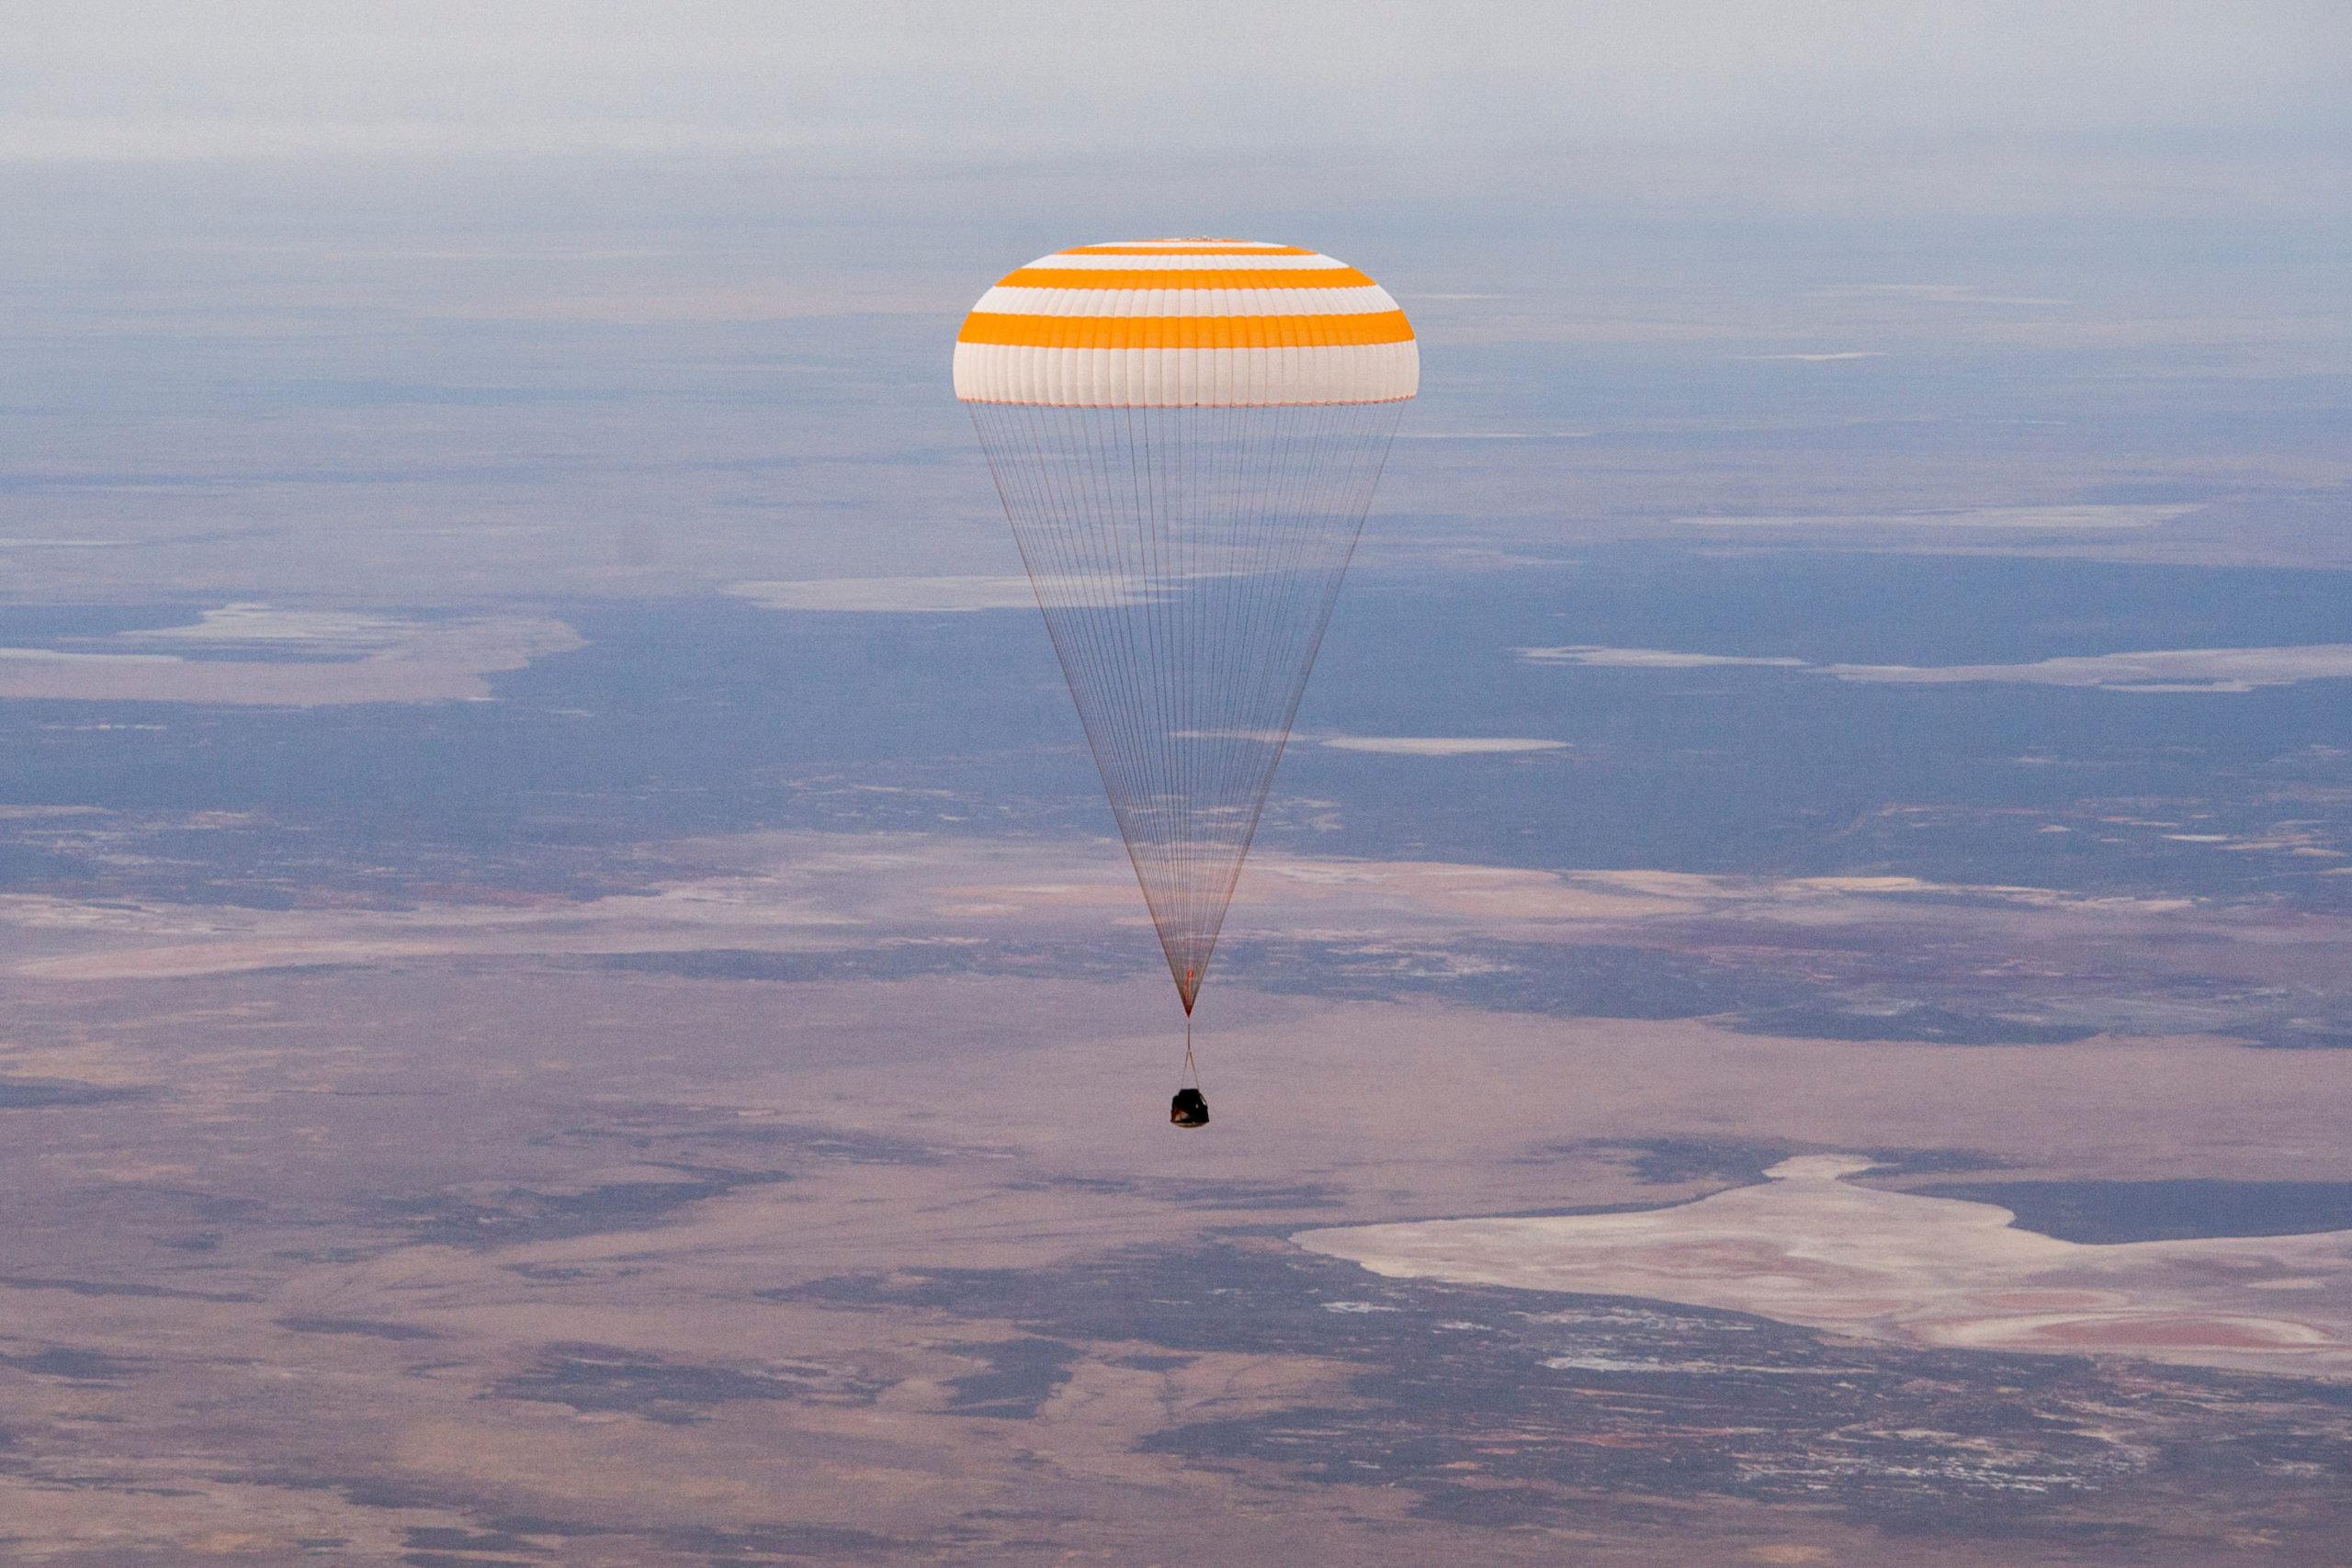 Soyuz Trio with NASA Astronaut Chris Cassidy Return Safely to Earth